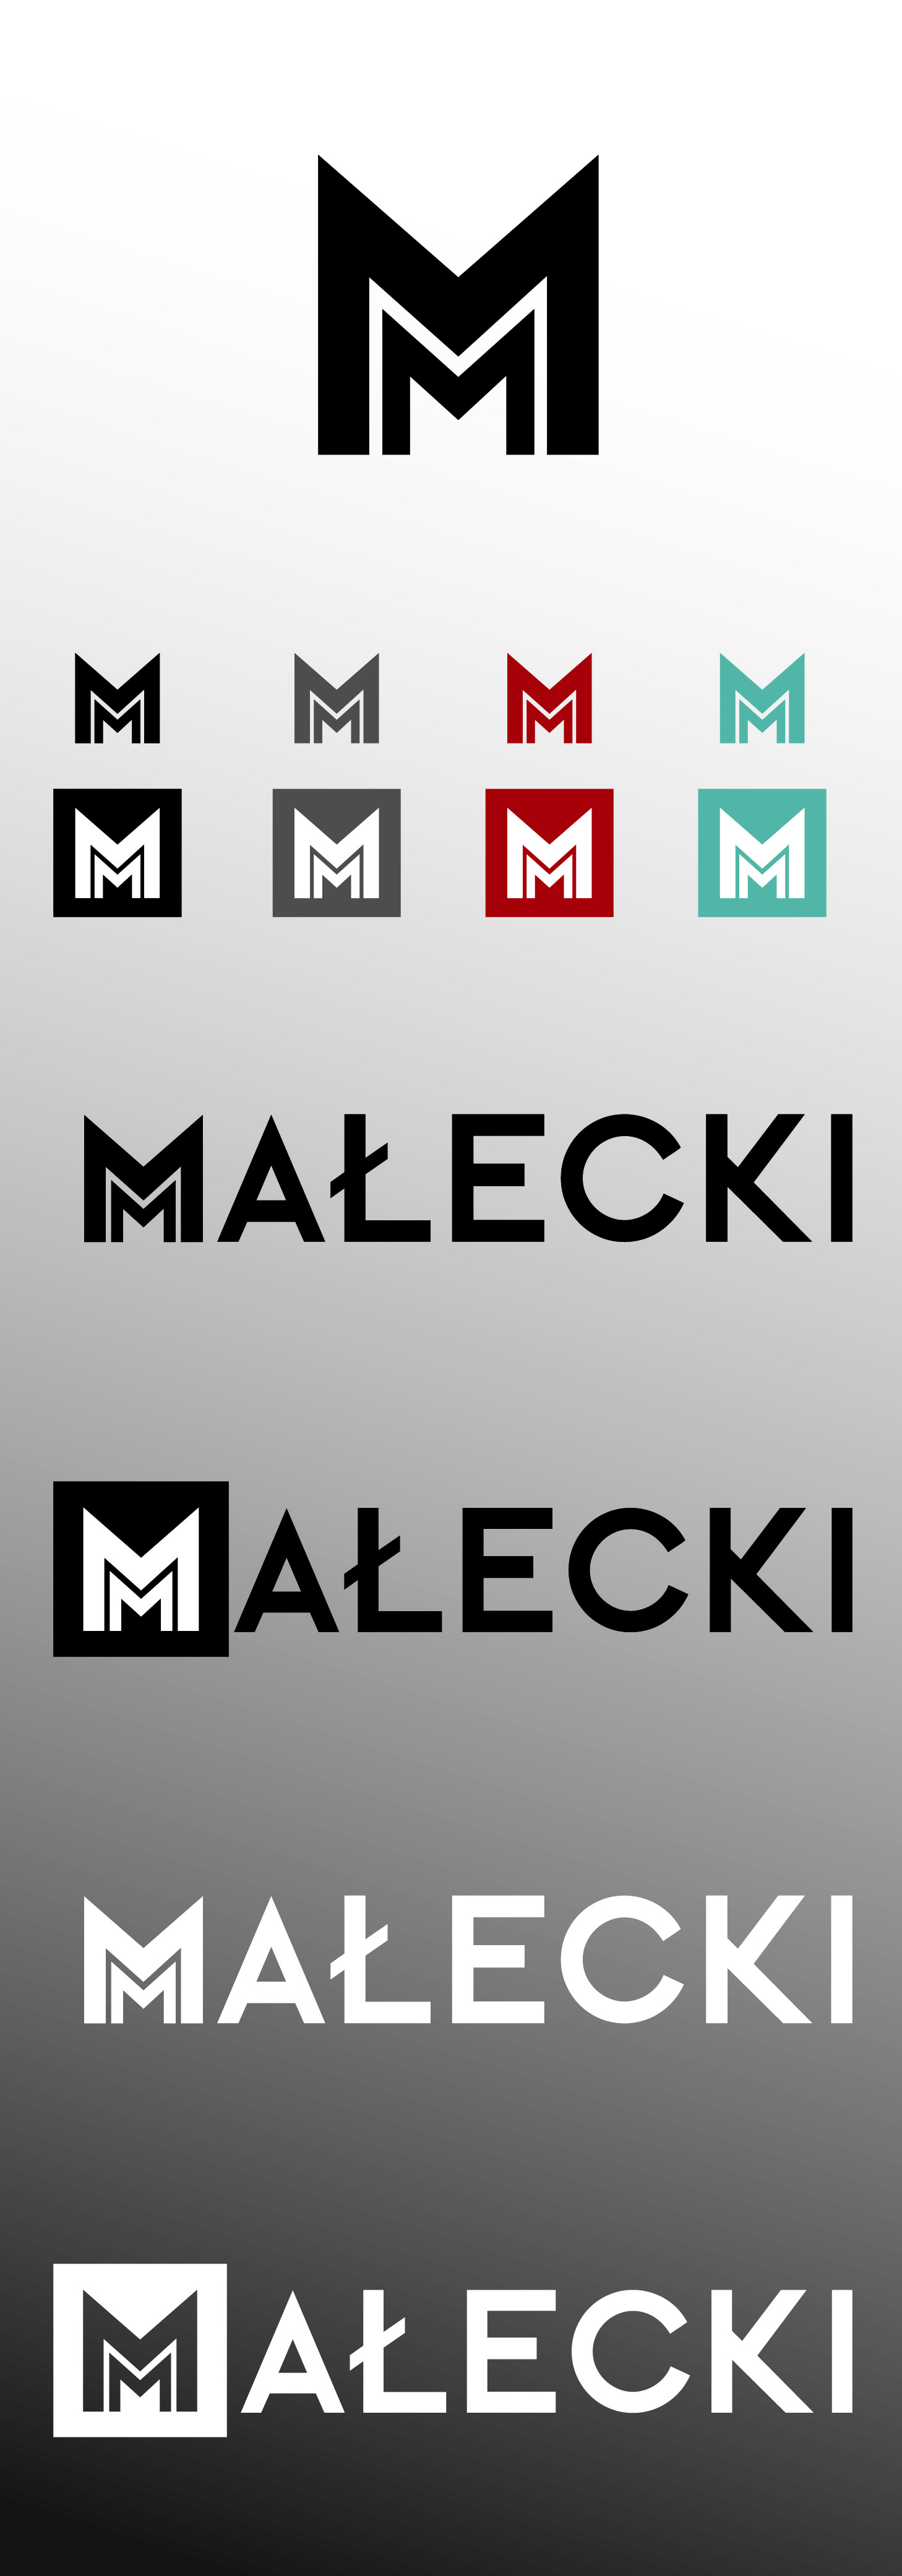 JAKUB_SLUSARCZYK_SKRZACIOR_mikolaj malecki_znak_graficzny-01-01